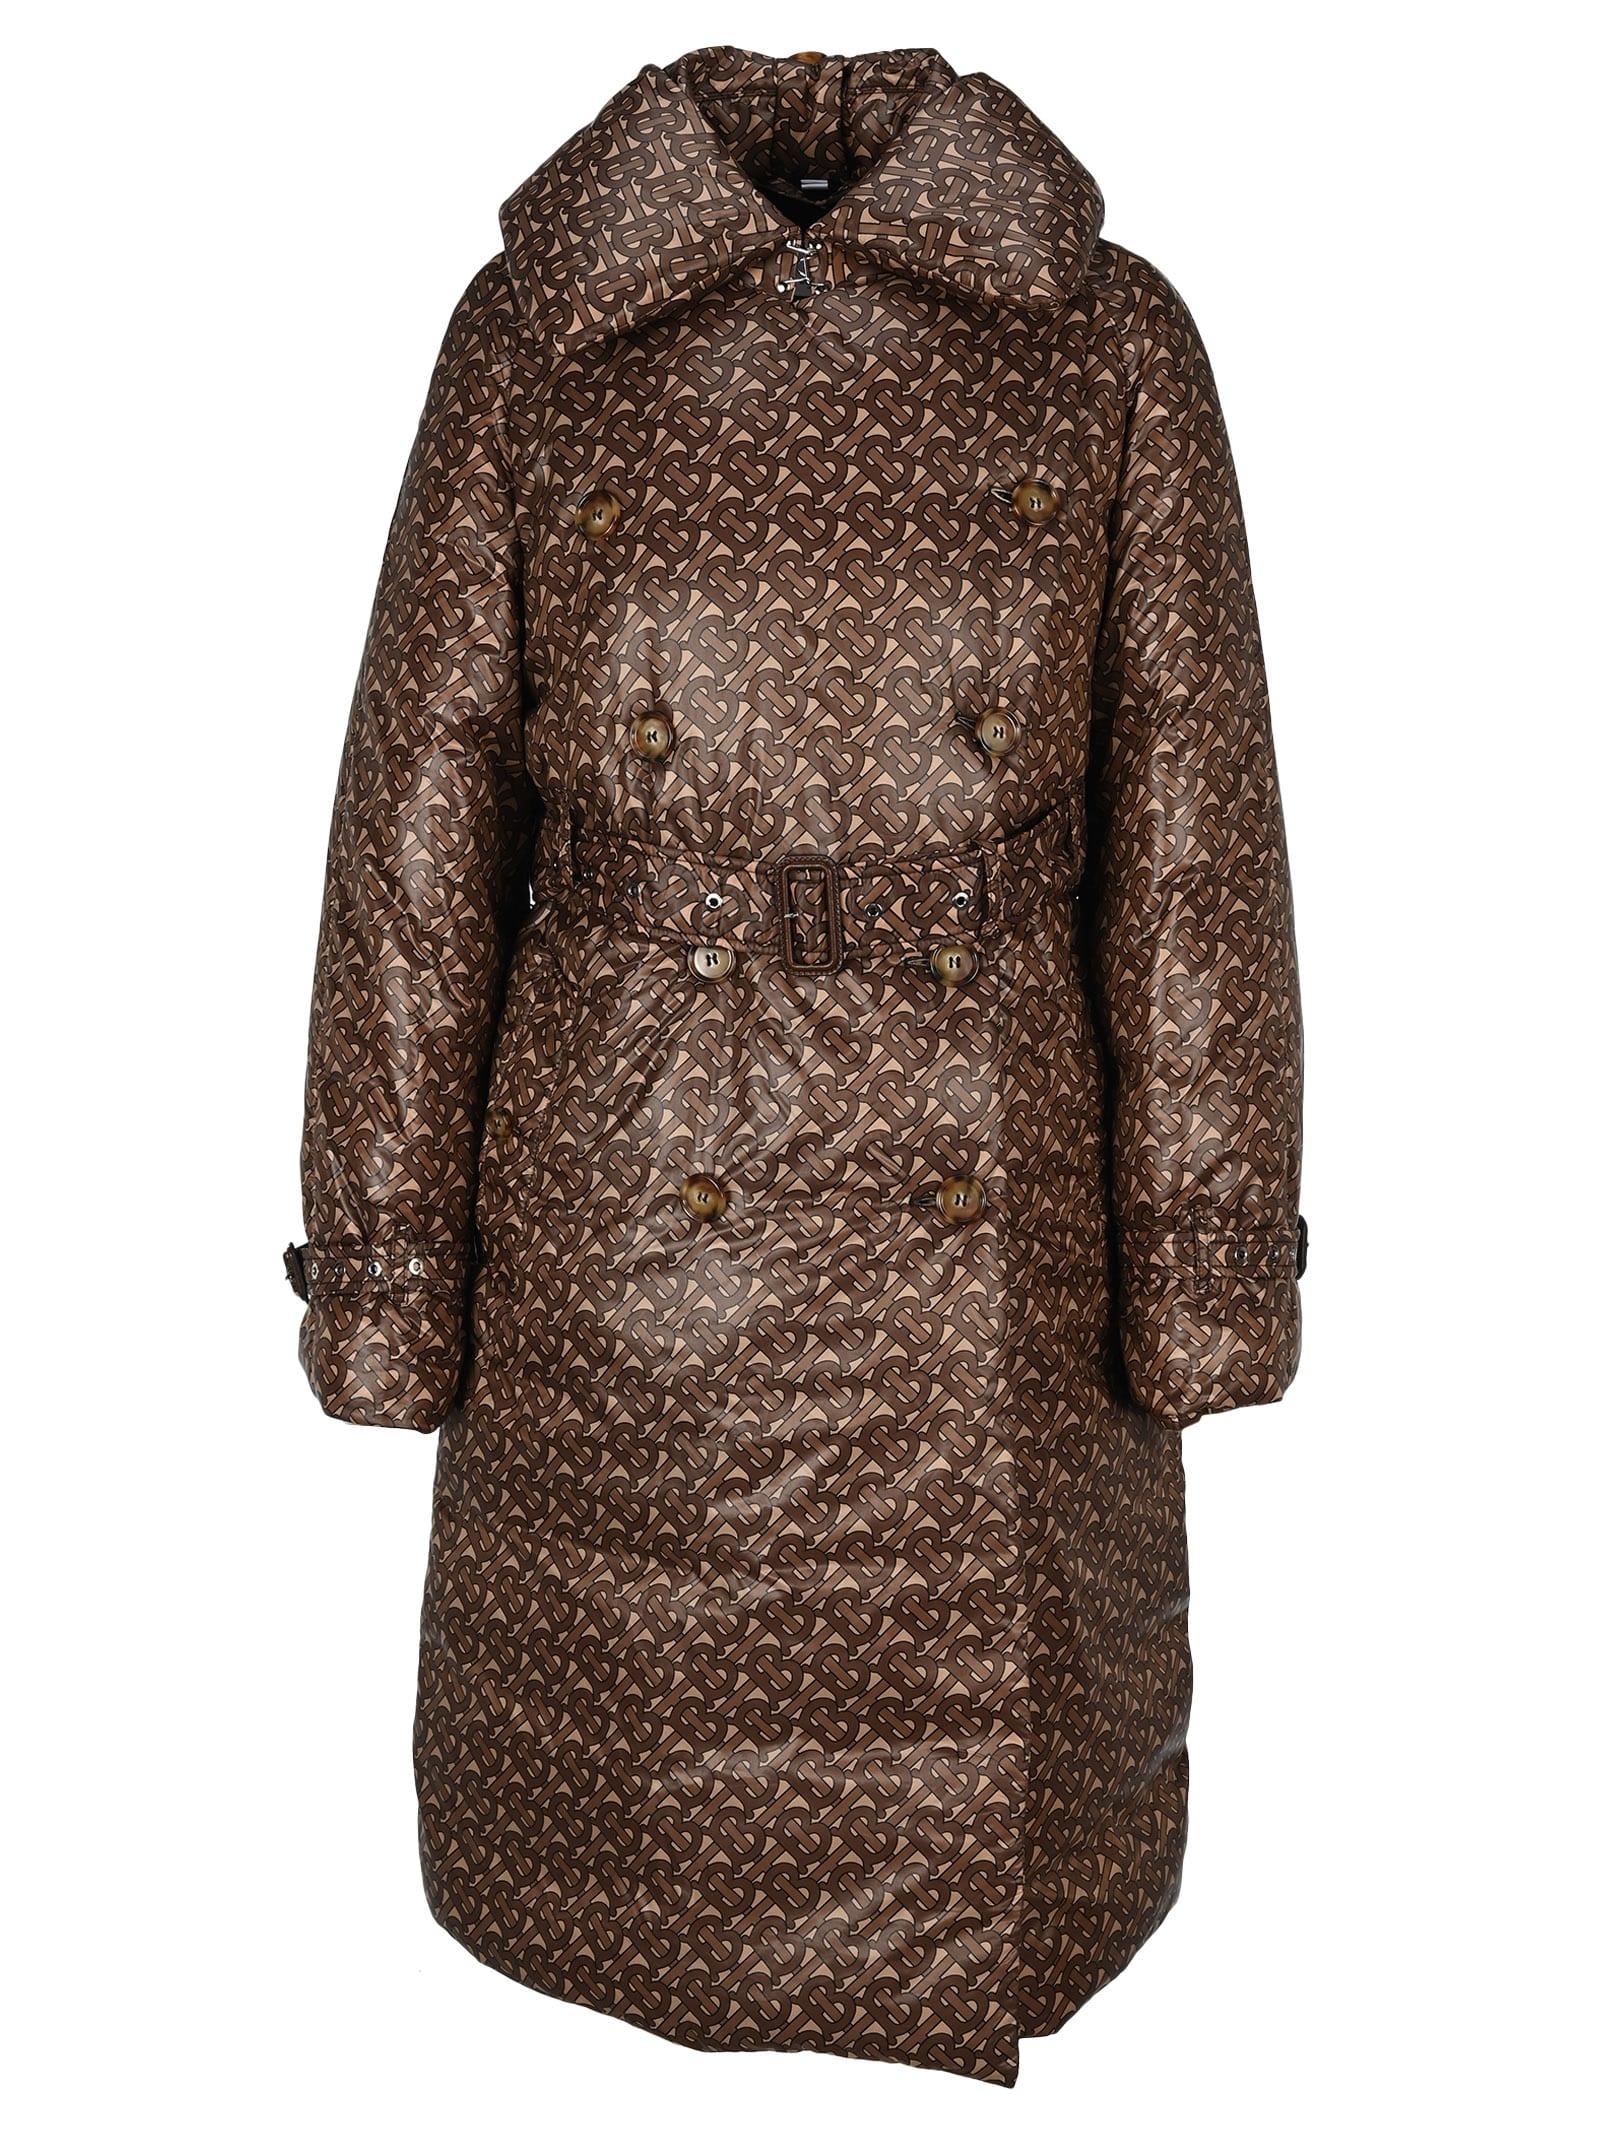 Burberry London Nylon Trench Coat With Padding And Monogram Print